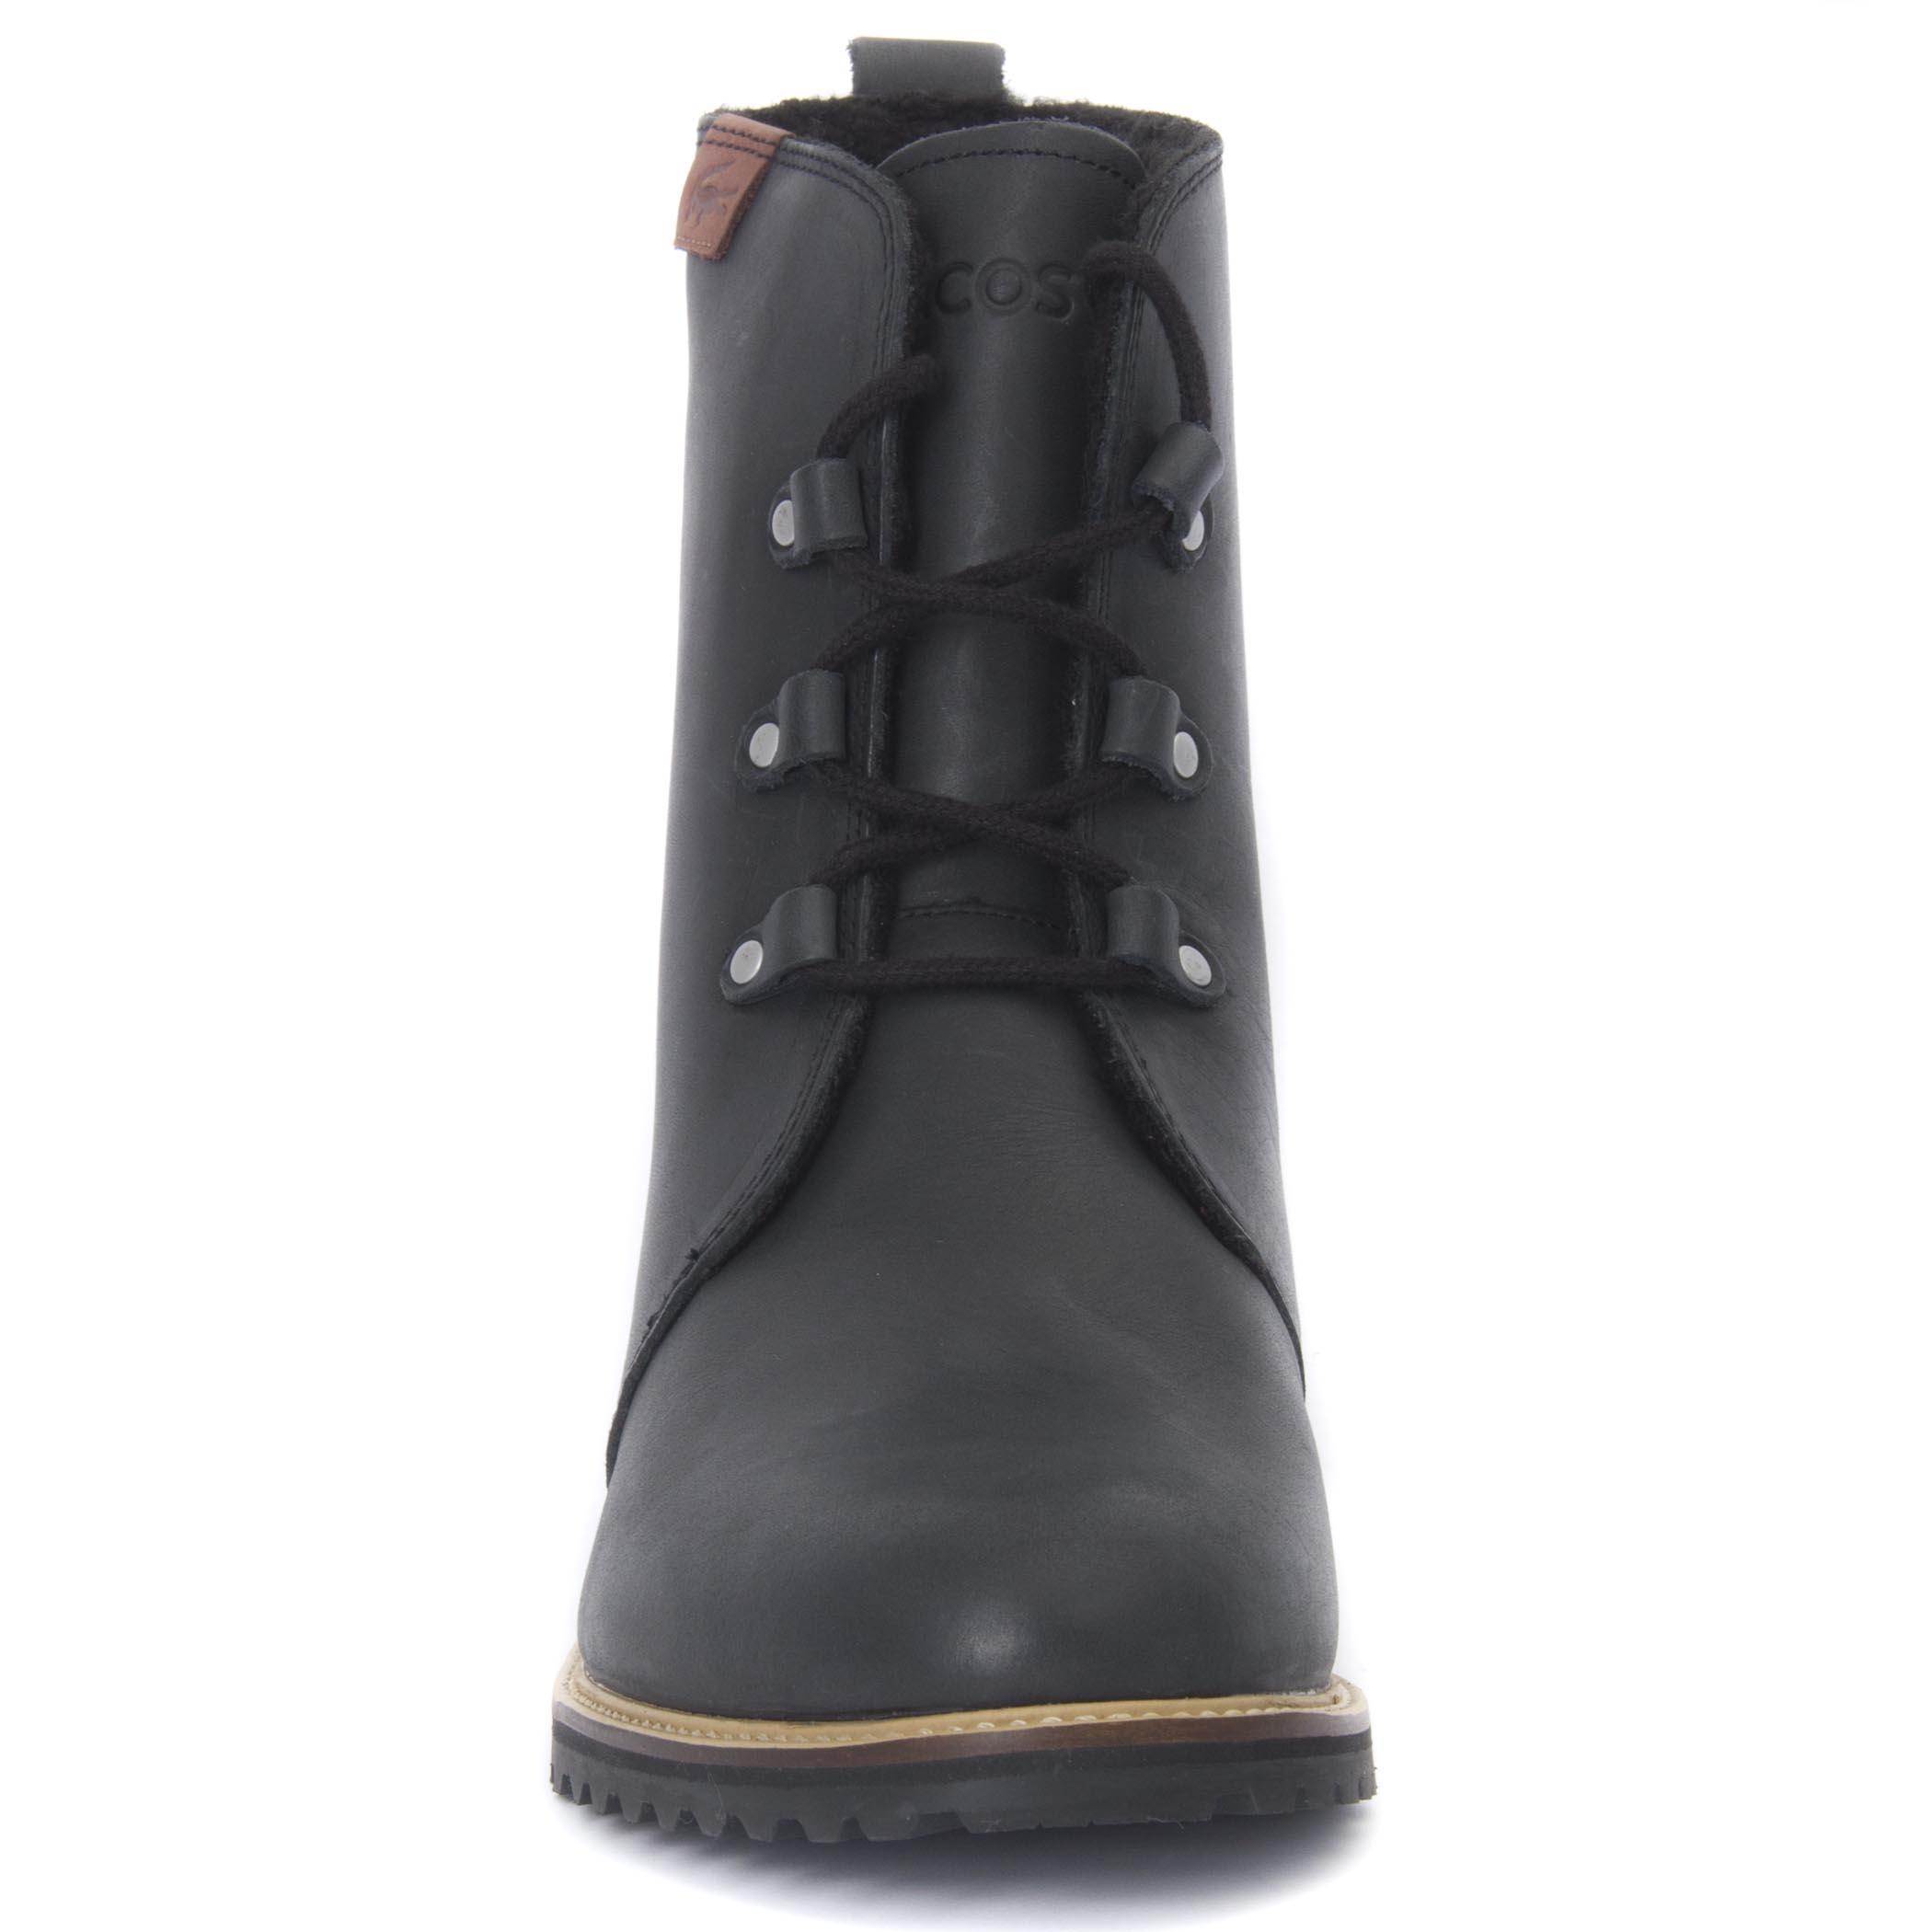 Lacoste Women's Baylen Leather Winter Boots